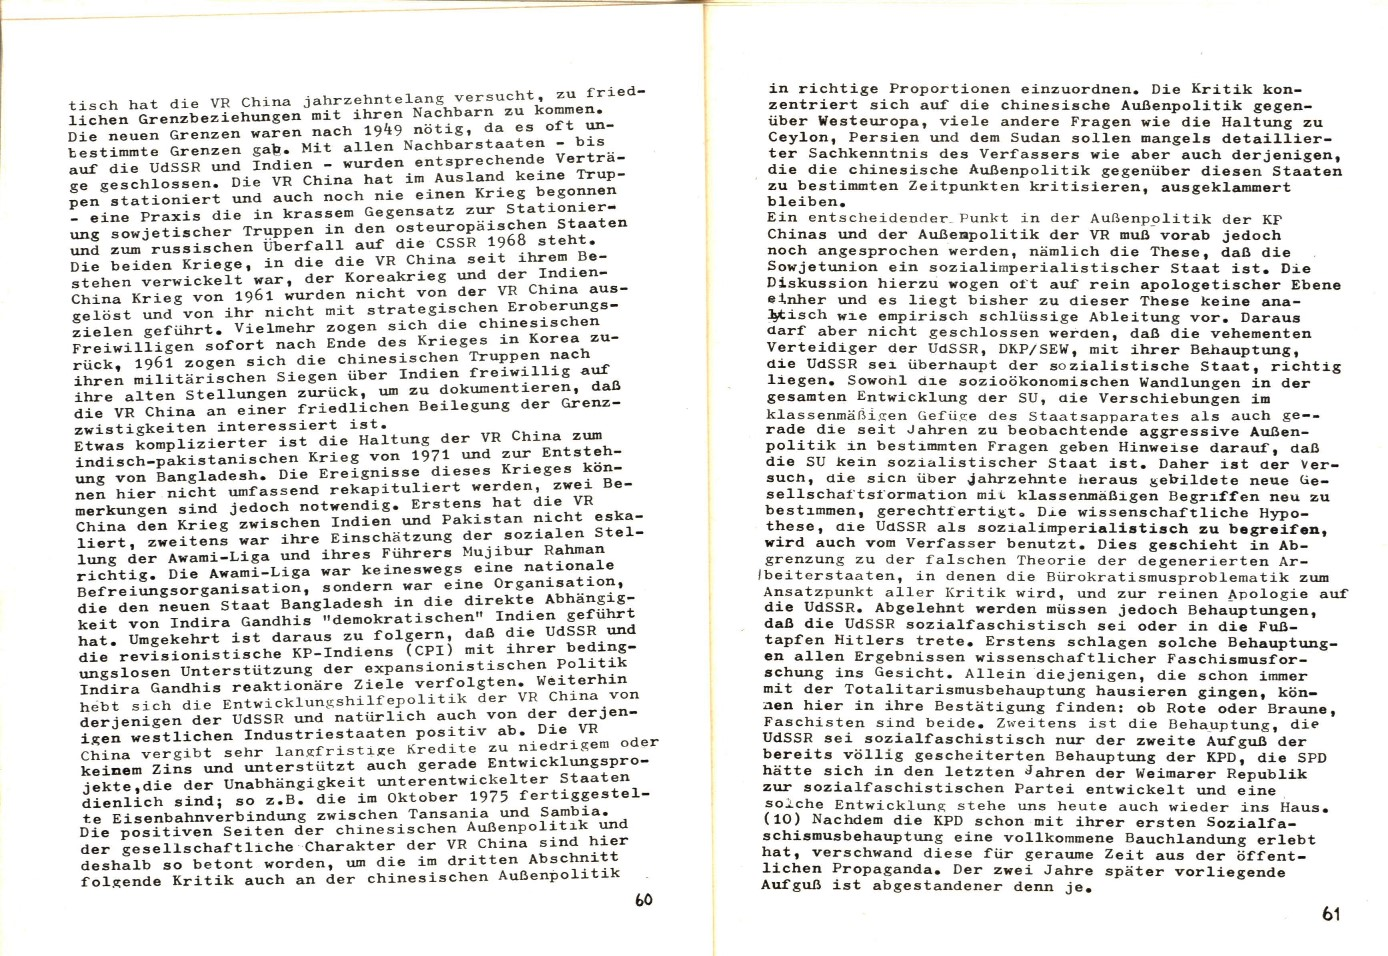 Berlin_KSV_1975_Dokumente_der_SAZ_32